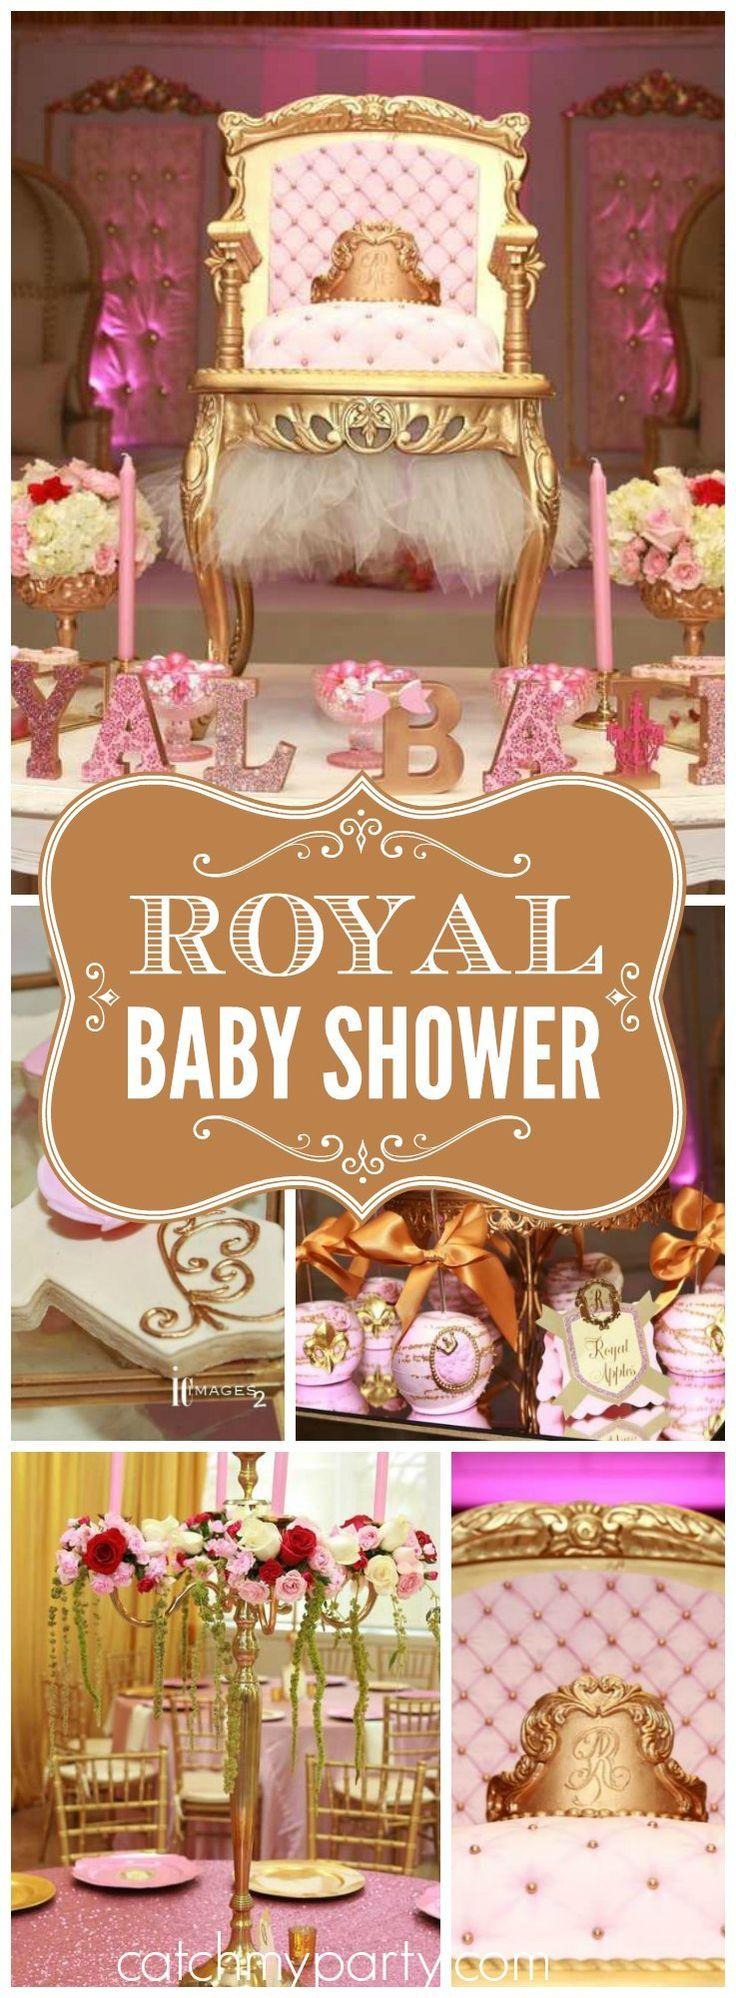 "Royal Baby Shower / Baby Shower ""Princess Royal Bailey ..."